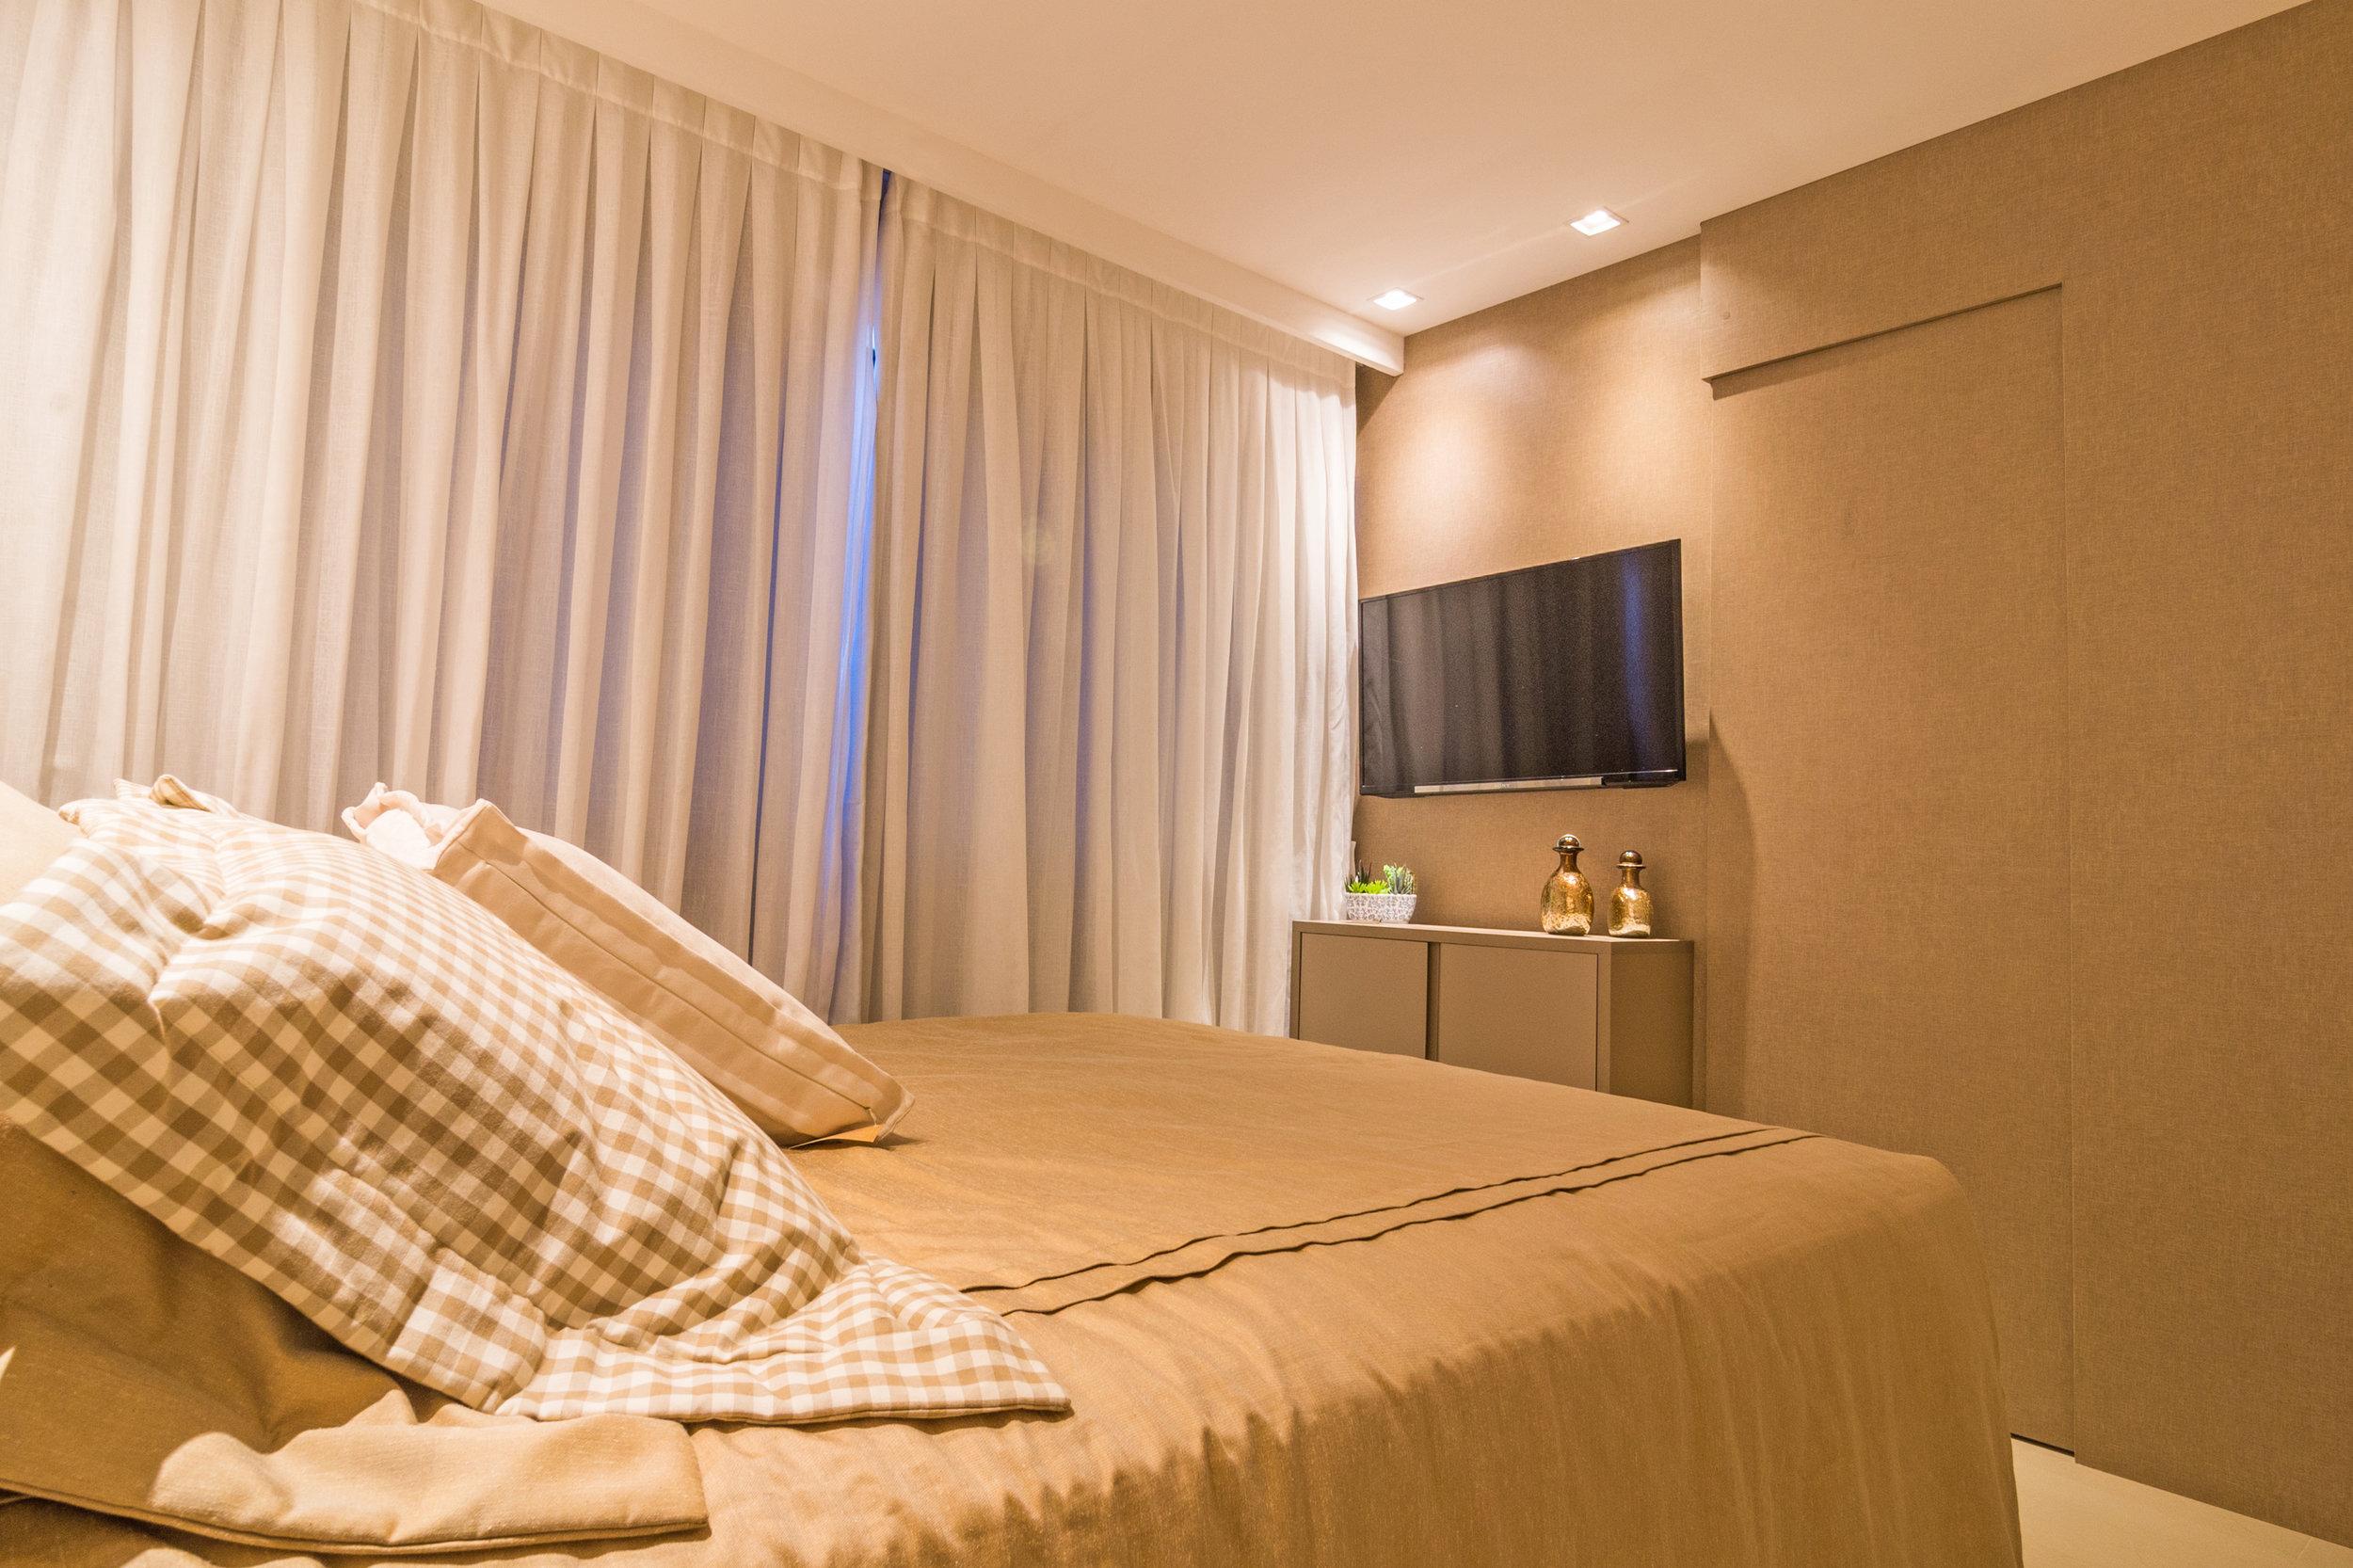 projeto-arquitetonico-rafaeldebora-duo-arquitetura-apartamentos-020.jpg